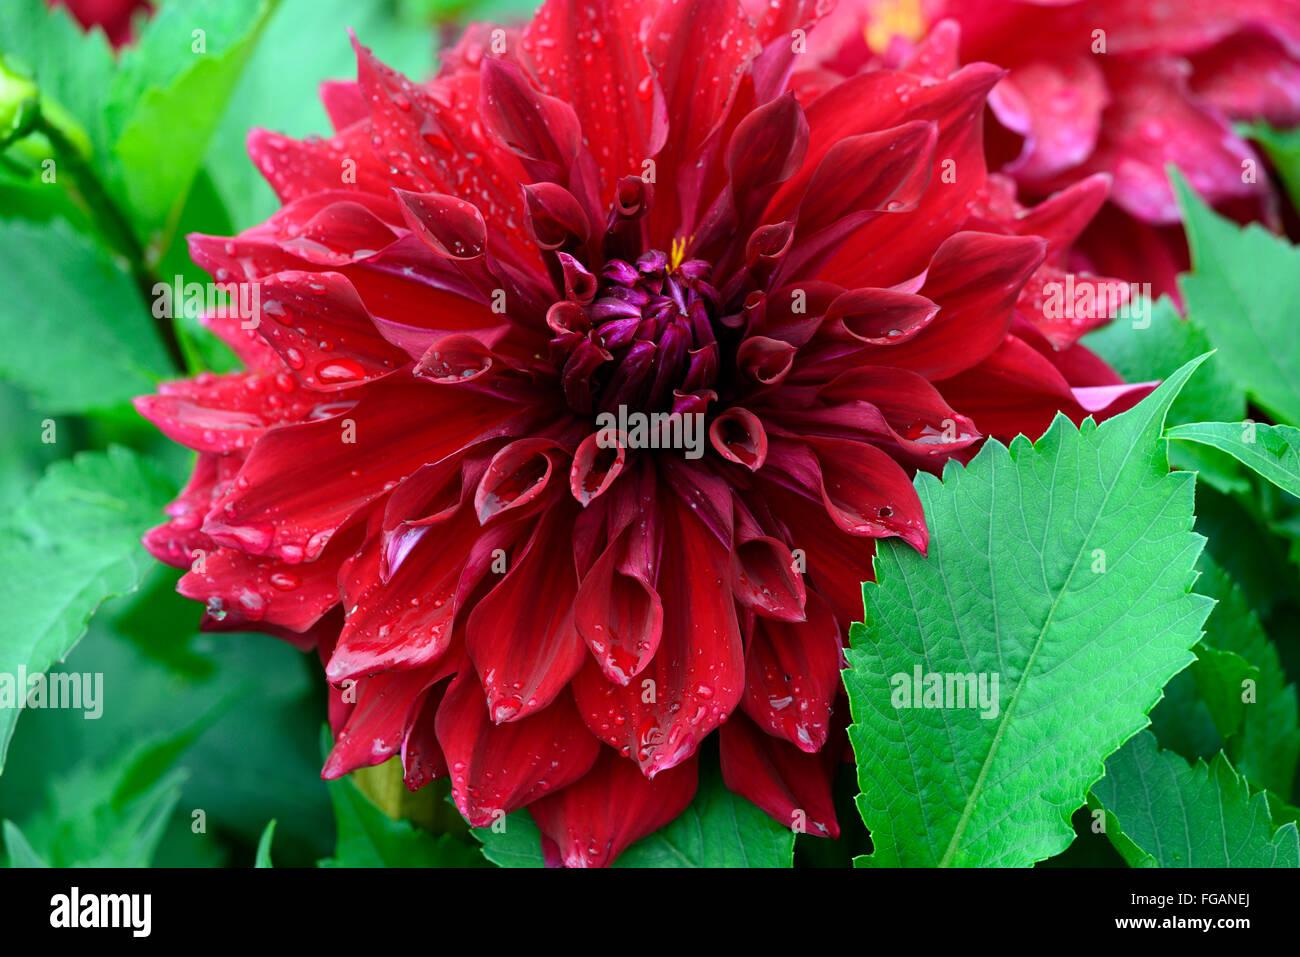 Dahlia Zorro Red Flower Bloom Blossom Decorative Double Flowers